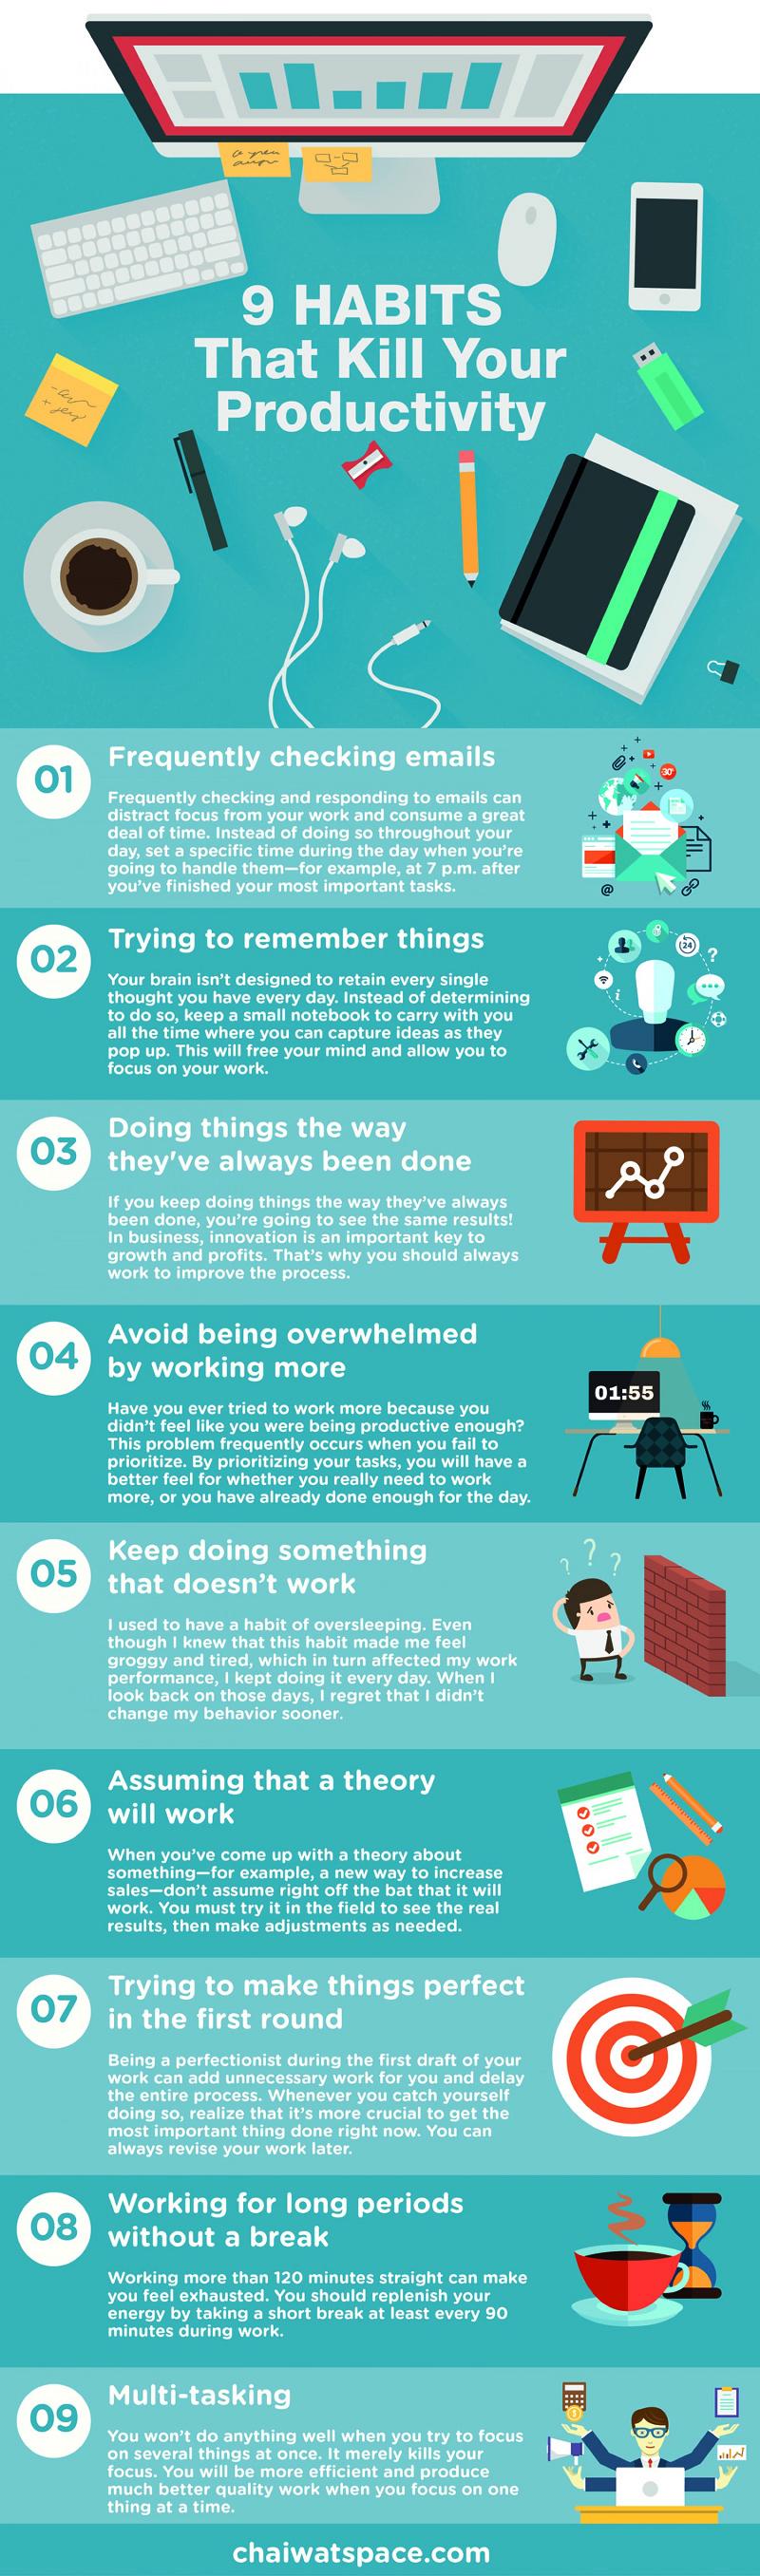 Habits-That-Hurt-Productivity